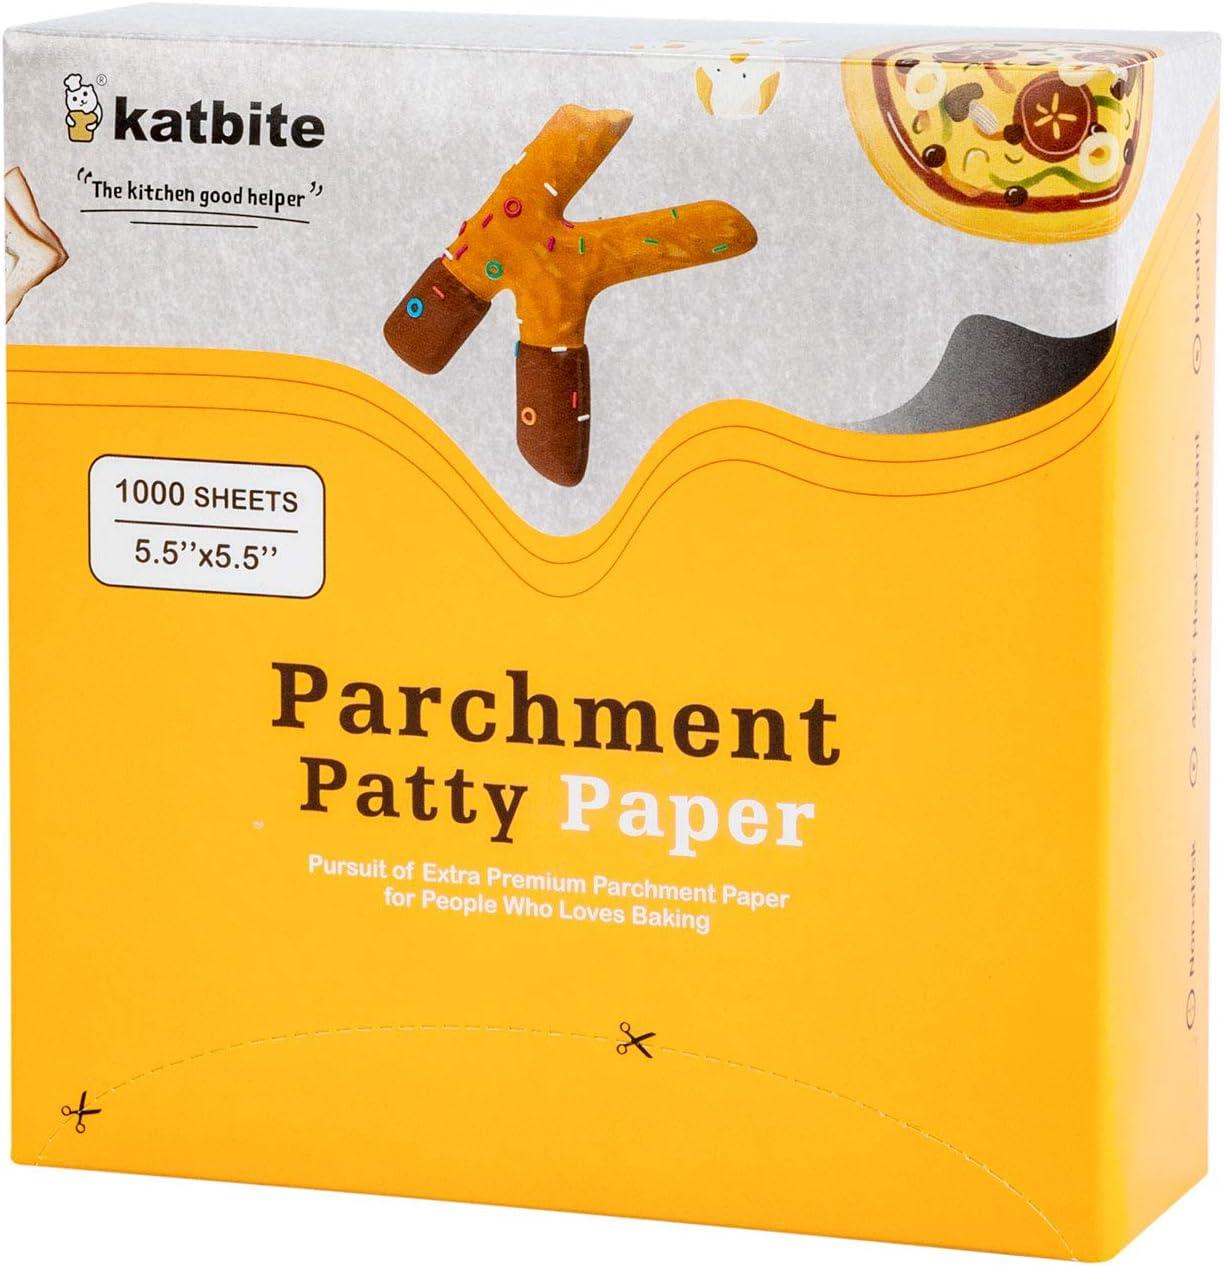 "Katbite Hamburger Patty Paper 1000 Pcs, 5.5""x5.5"" Non Stick Parchment Paper Square"